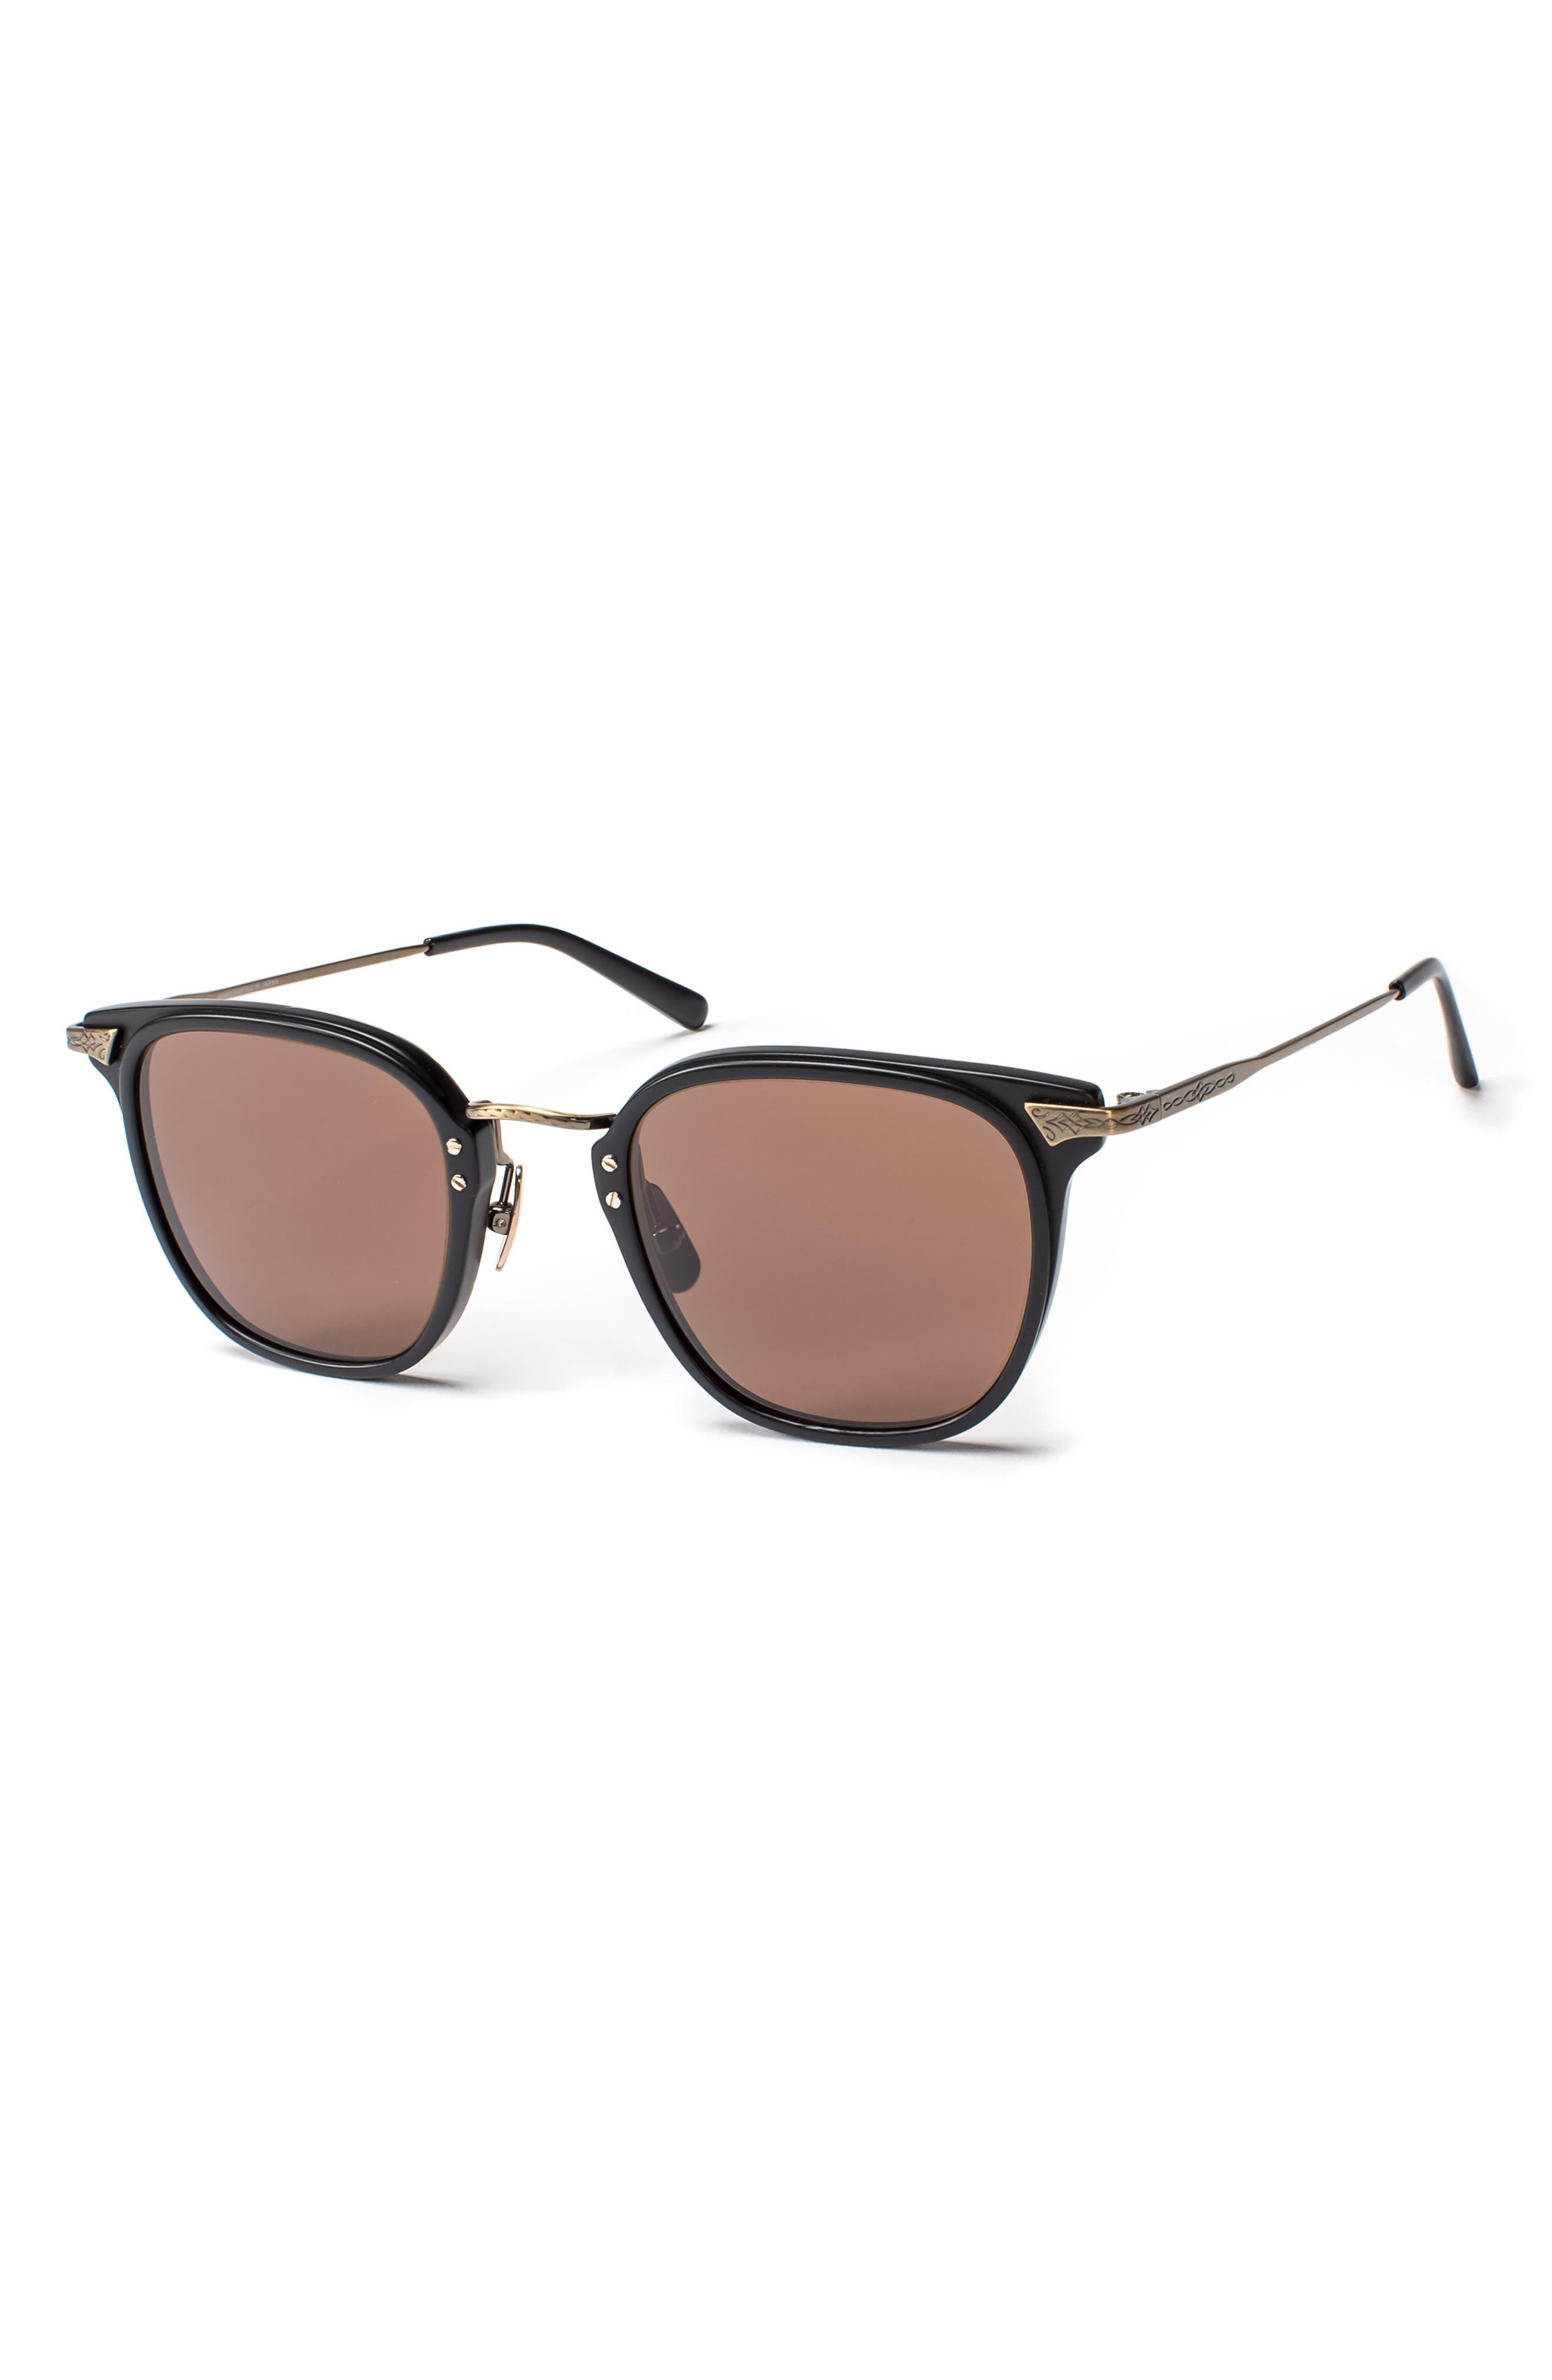 Hamilton 48mm Polarized Sunglasses,                         Main,                         color, MATTE BLACK / ANTIQUE GOLD